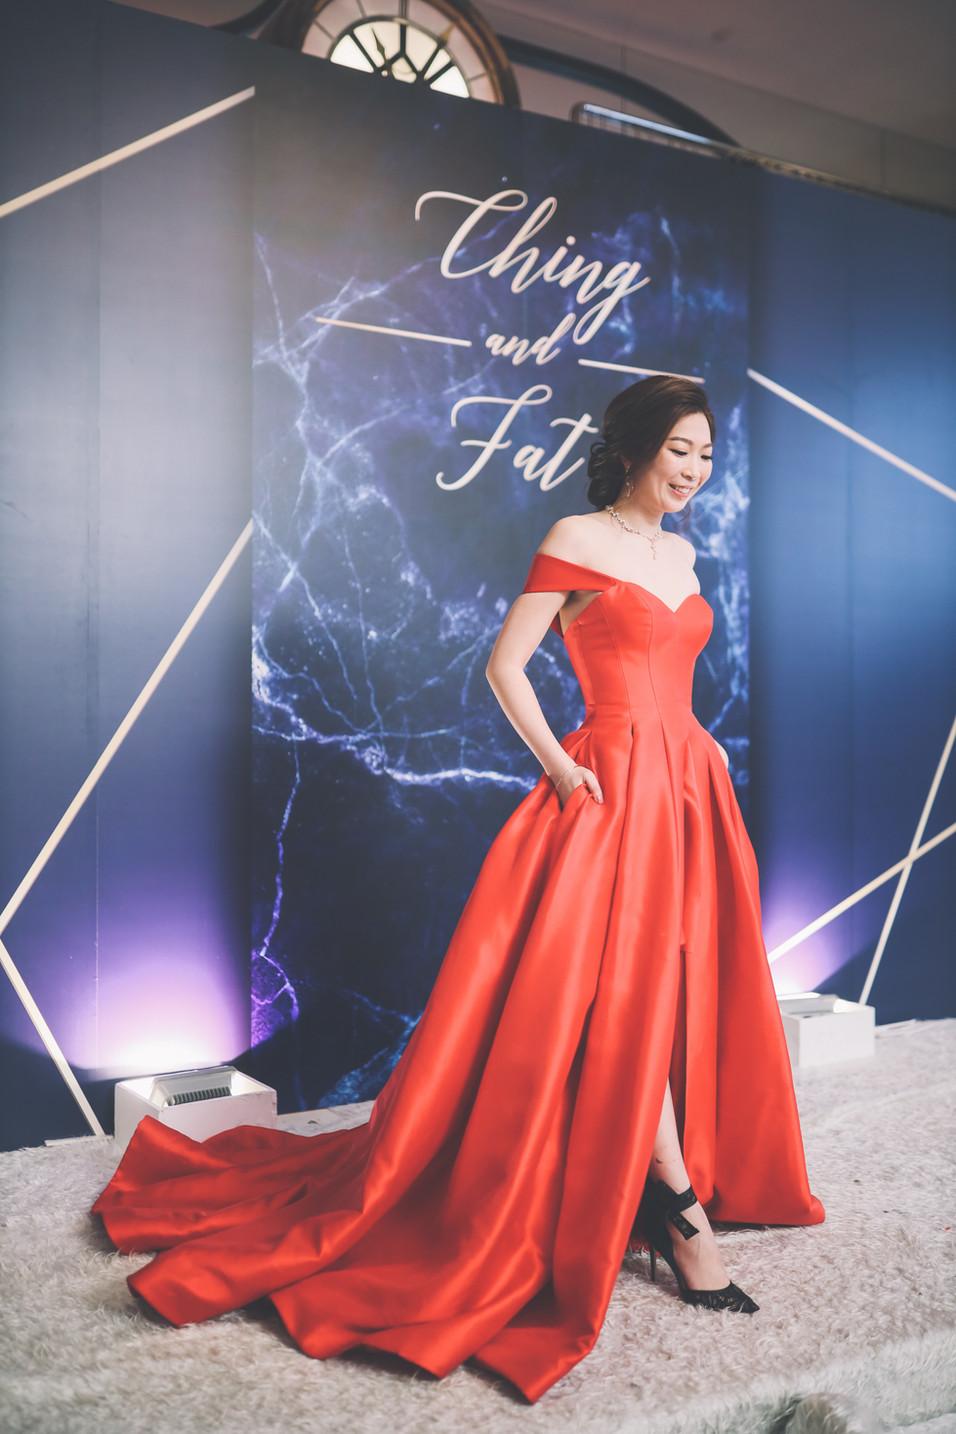 Chingching & Fat - 19 Feb 2019